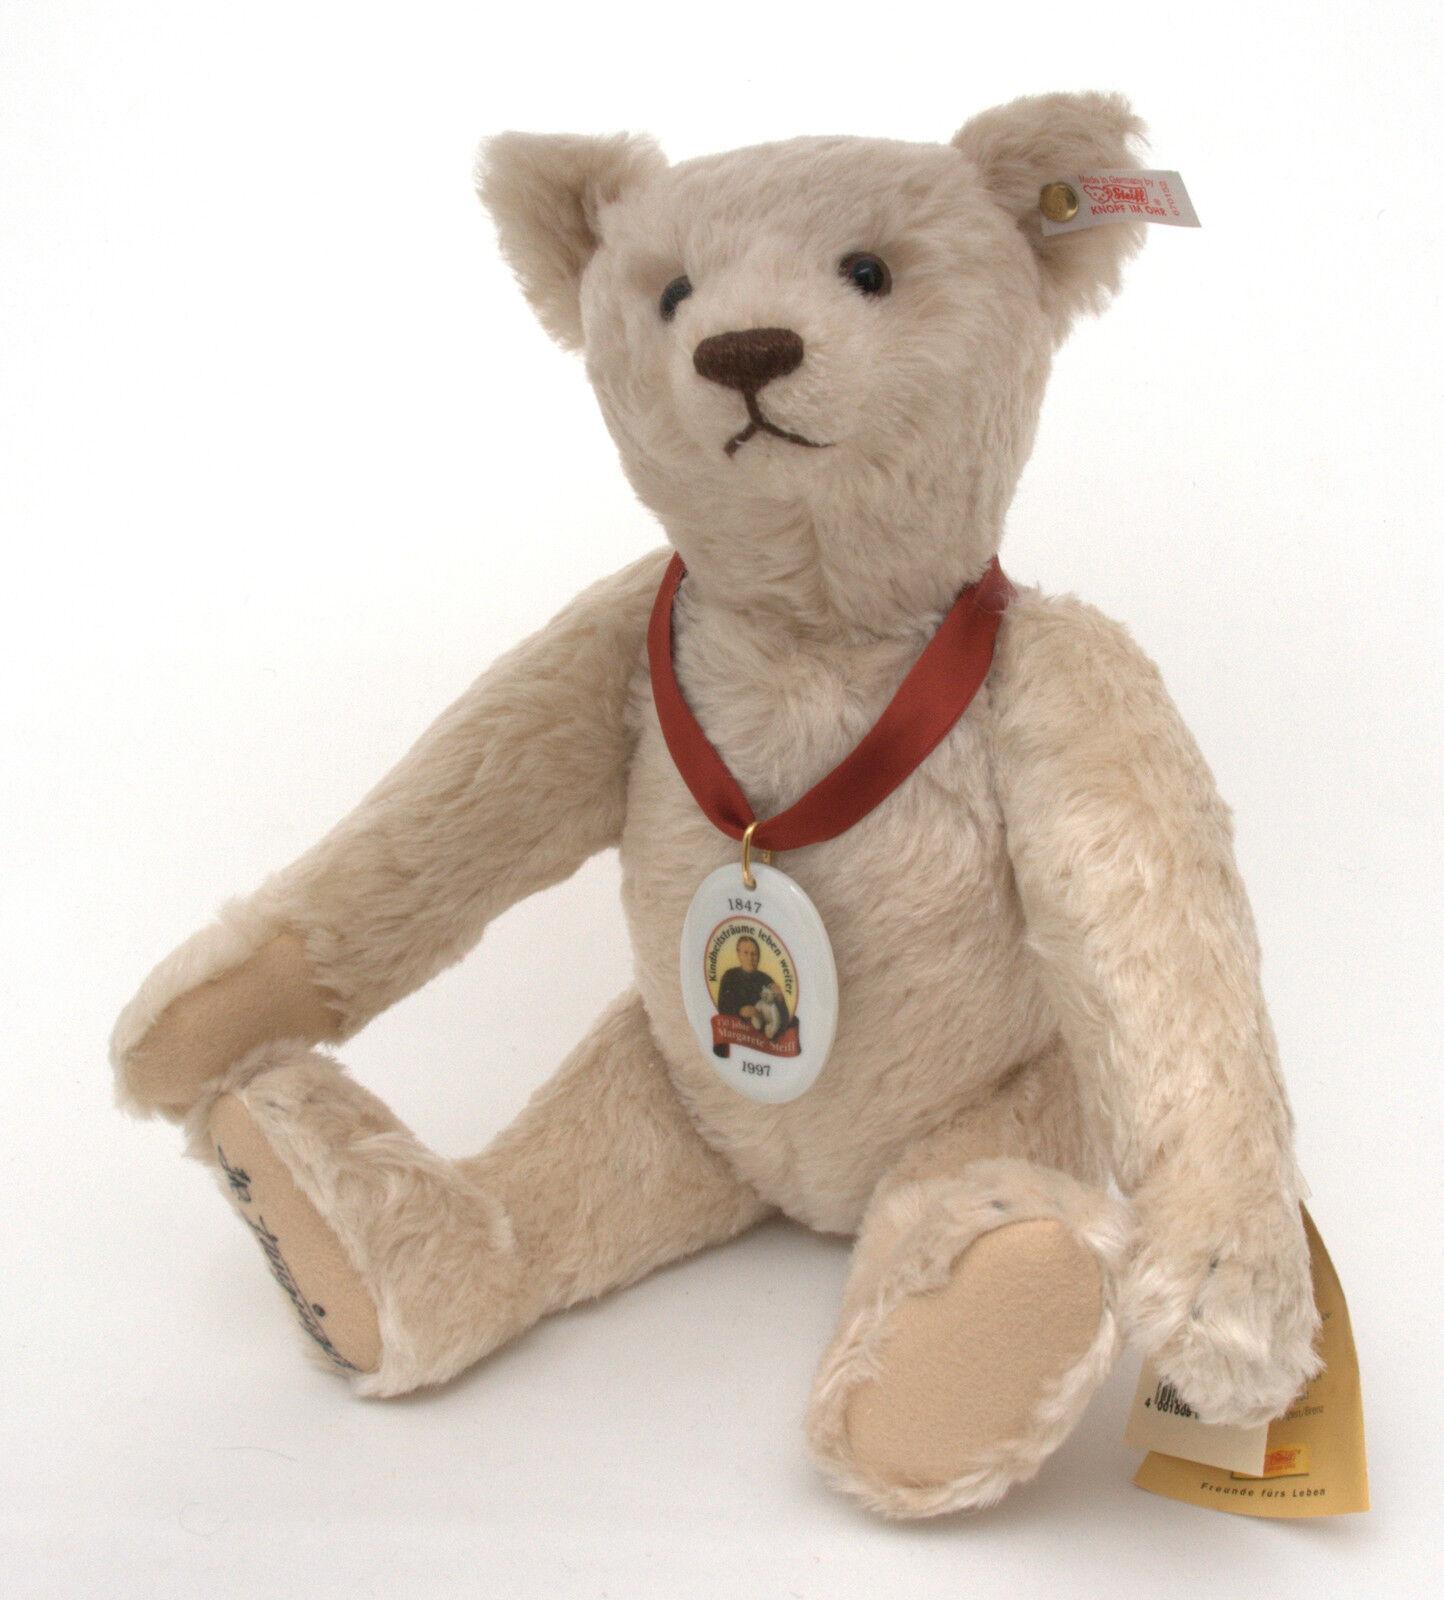 Steiff Jubilee Teddy Bear 1997 - Ltd Ltd Ltd Edition - 40cm - 670152 6dd051